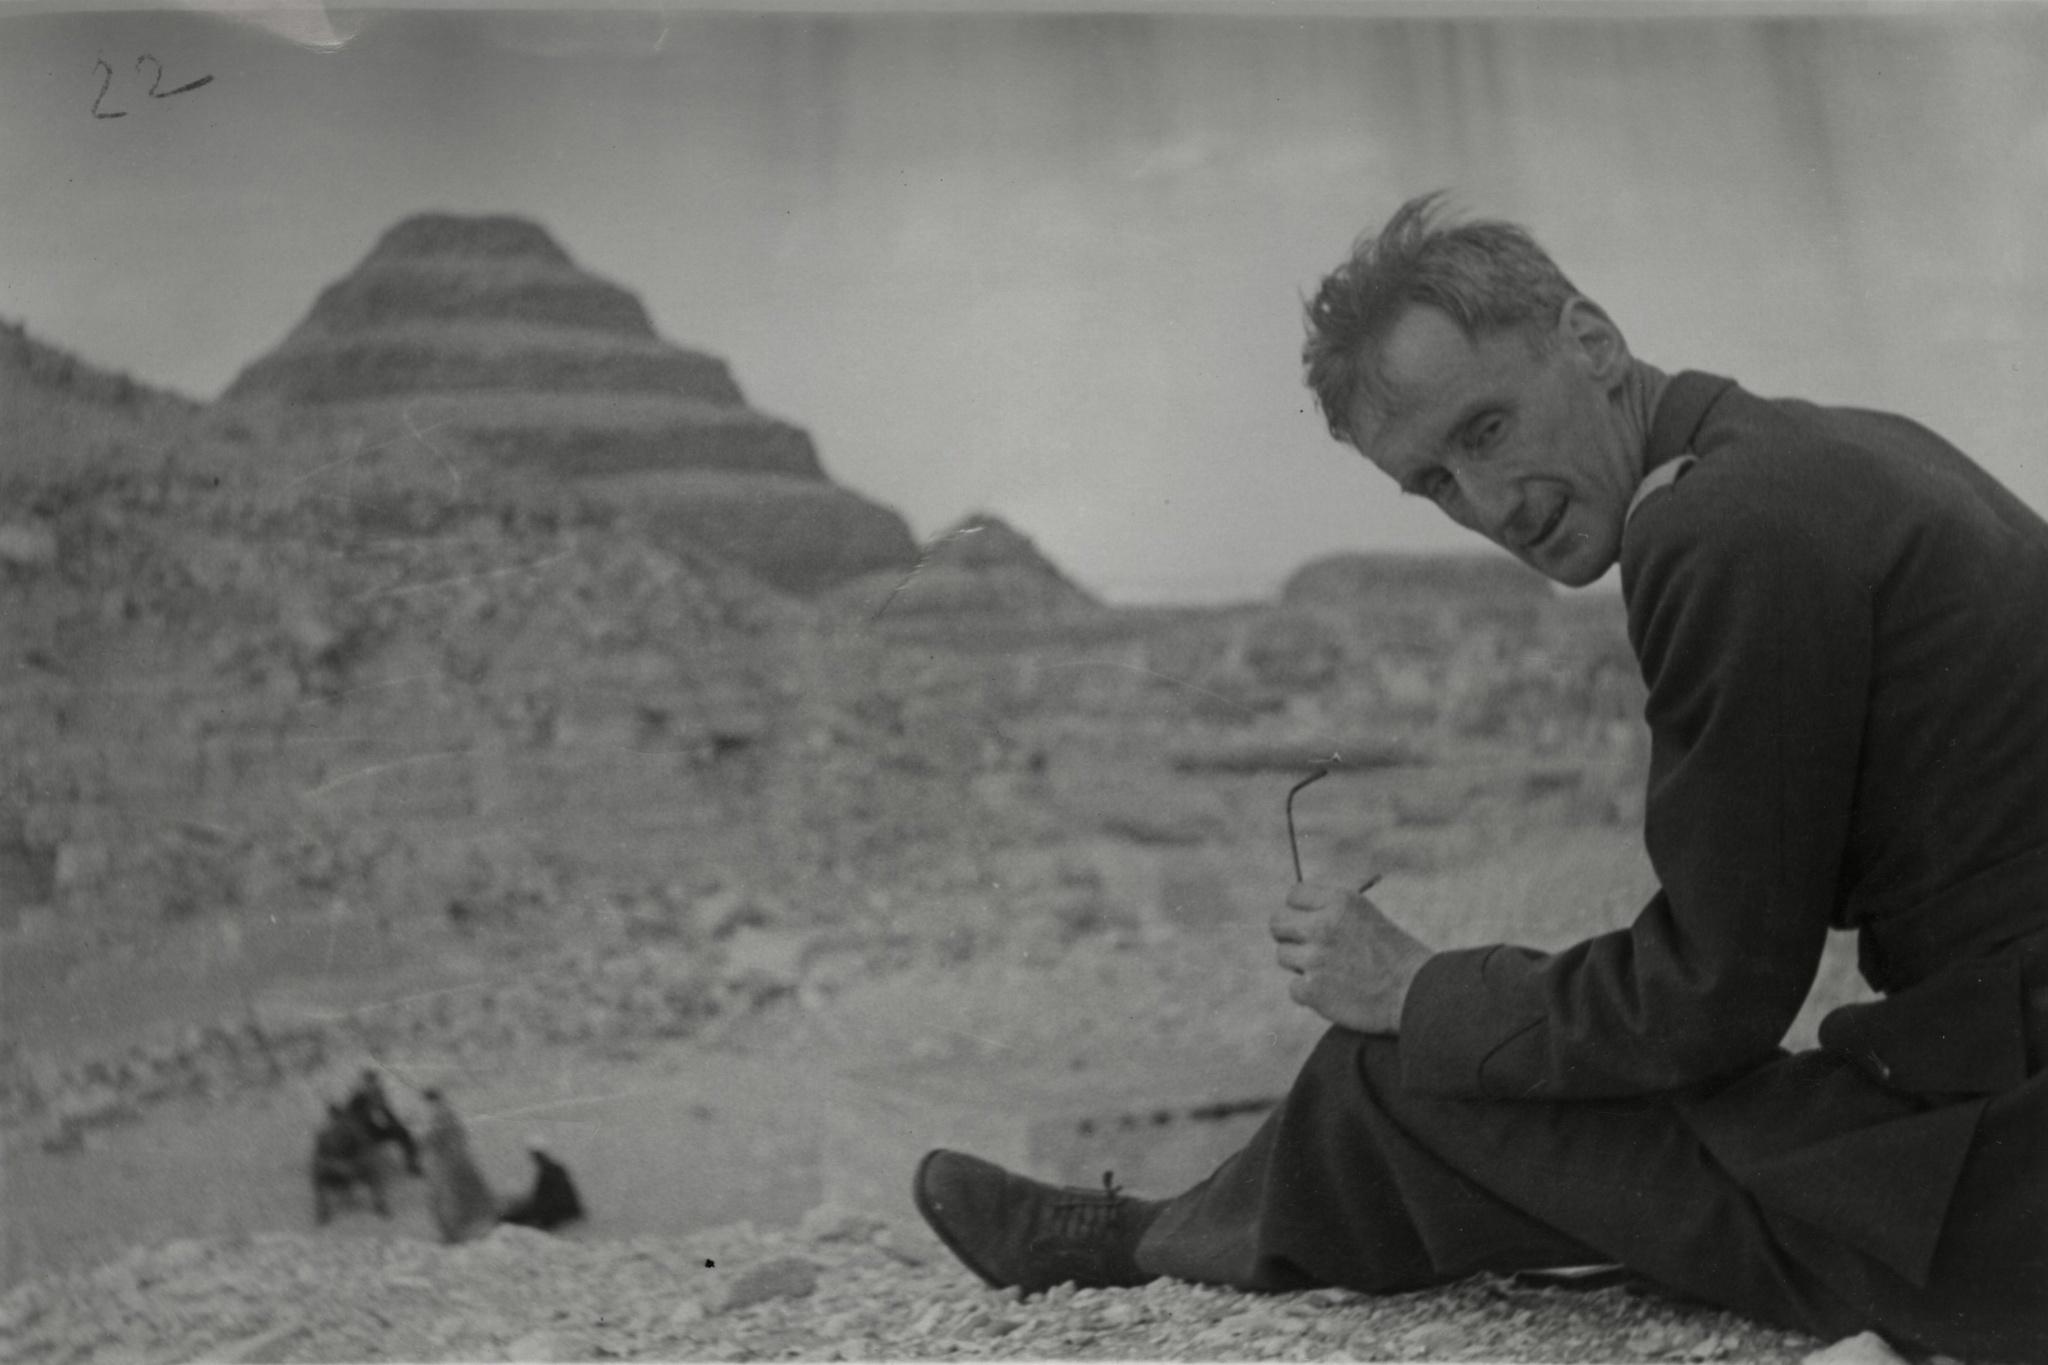 <div class='inner-box'><div class='close-desc'></div><span class='opis'>Józef Czapski pod piramidami. Egipt, 1943.</span><div class='clearfix'></div><span>Archive ref. FIL00081</span><div class='clearfix'></div><span>© Instytut Literacki</span></div>